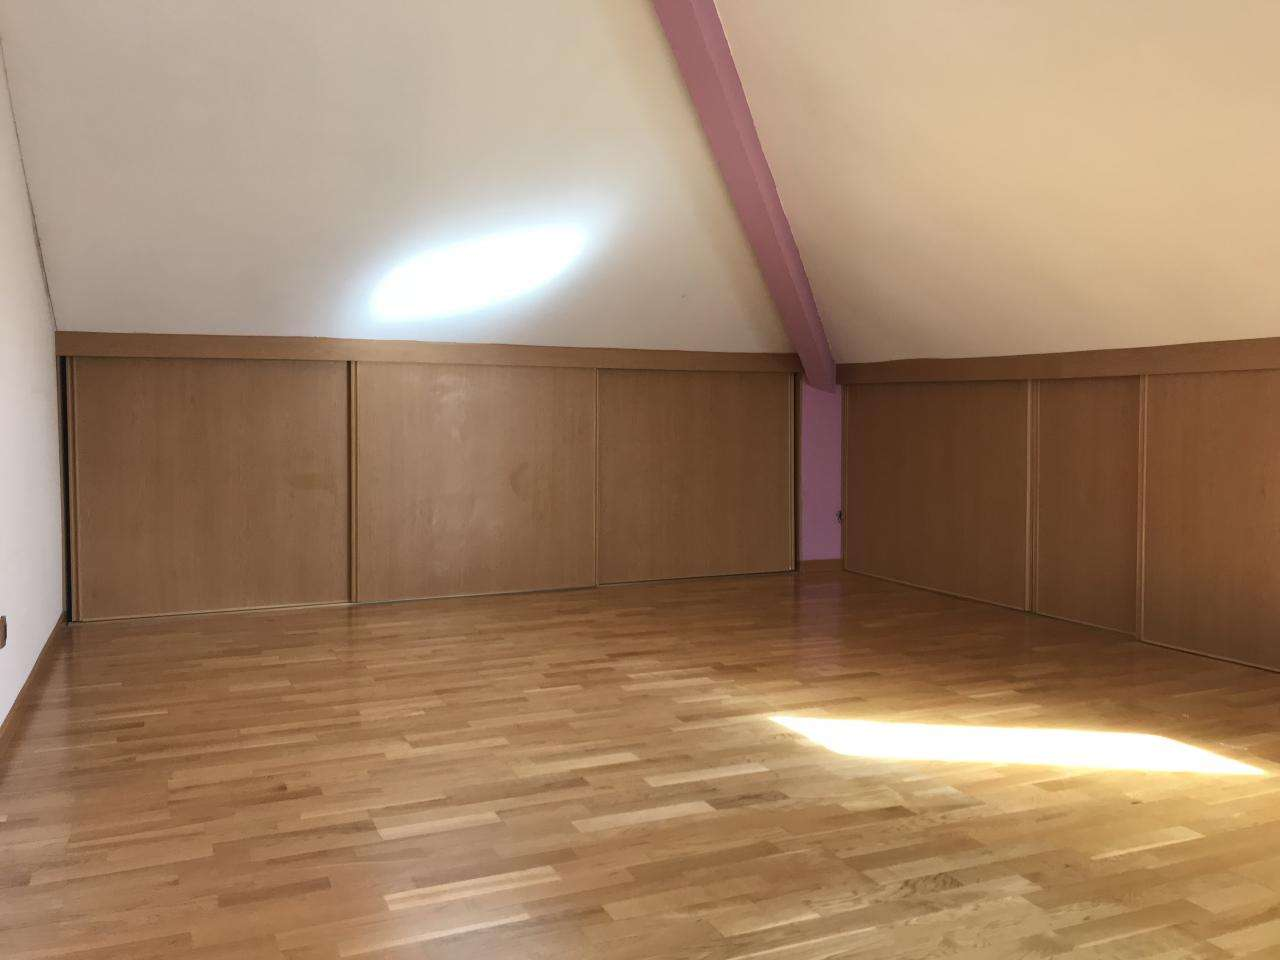 Apartamento para comprar, Montijo e Afonsoeiro, Montijo, Setúbal - Foto 22